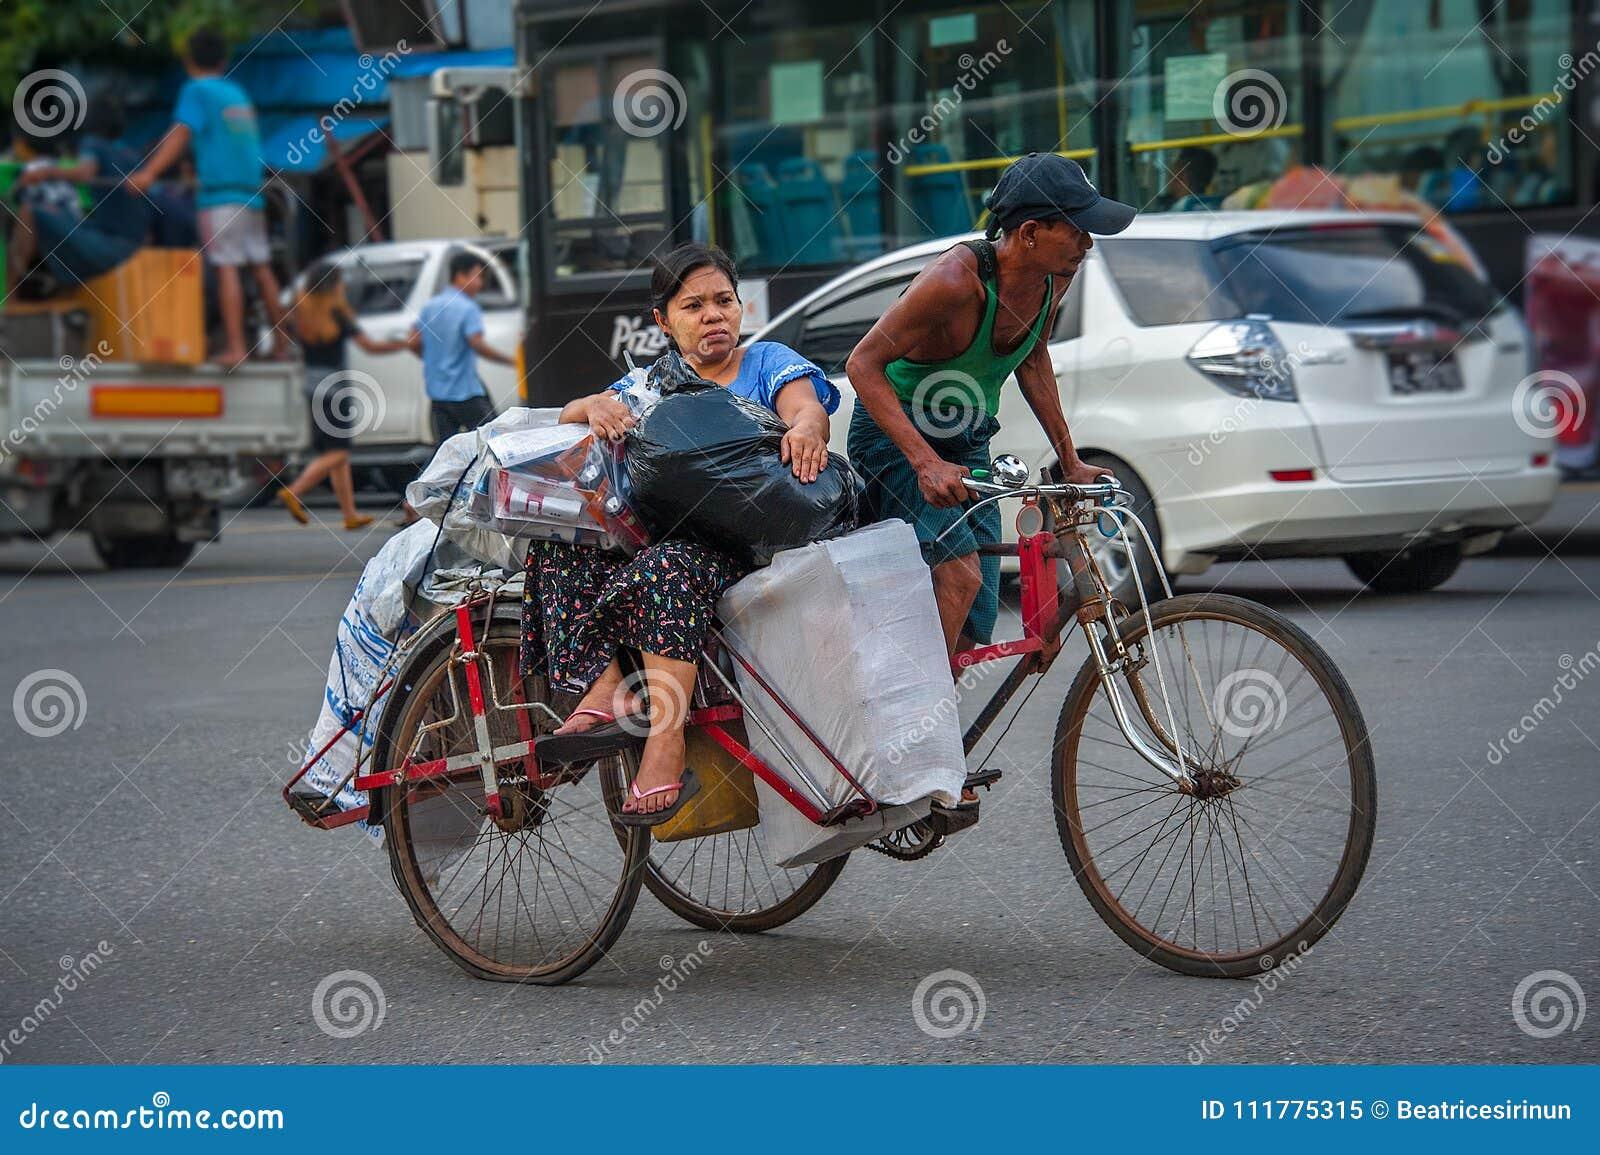 DAILY LIFE IN YANGON